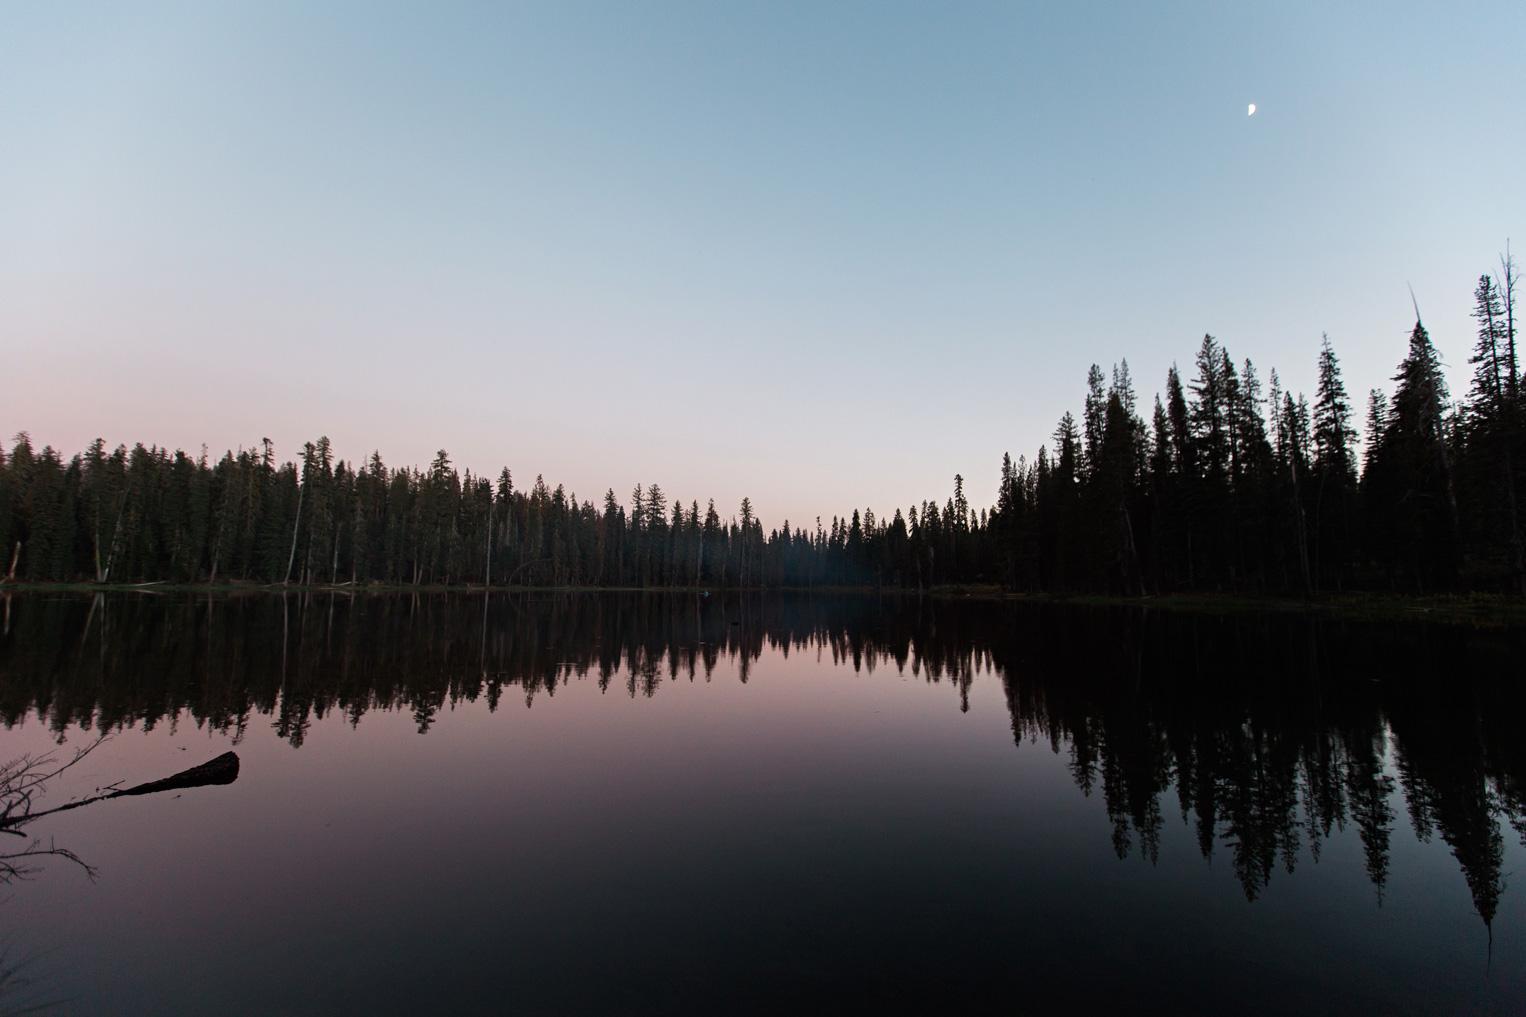 CindyGiovagnoli_Lassen_Volcanic_National_Park_California_camp_road_trip-026.jpg